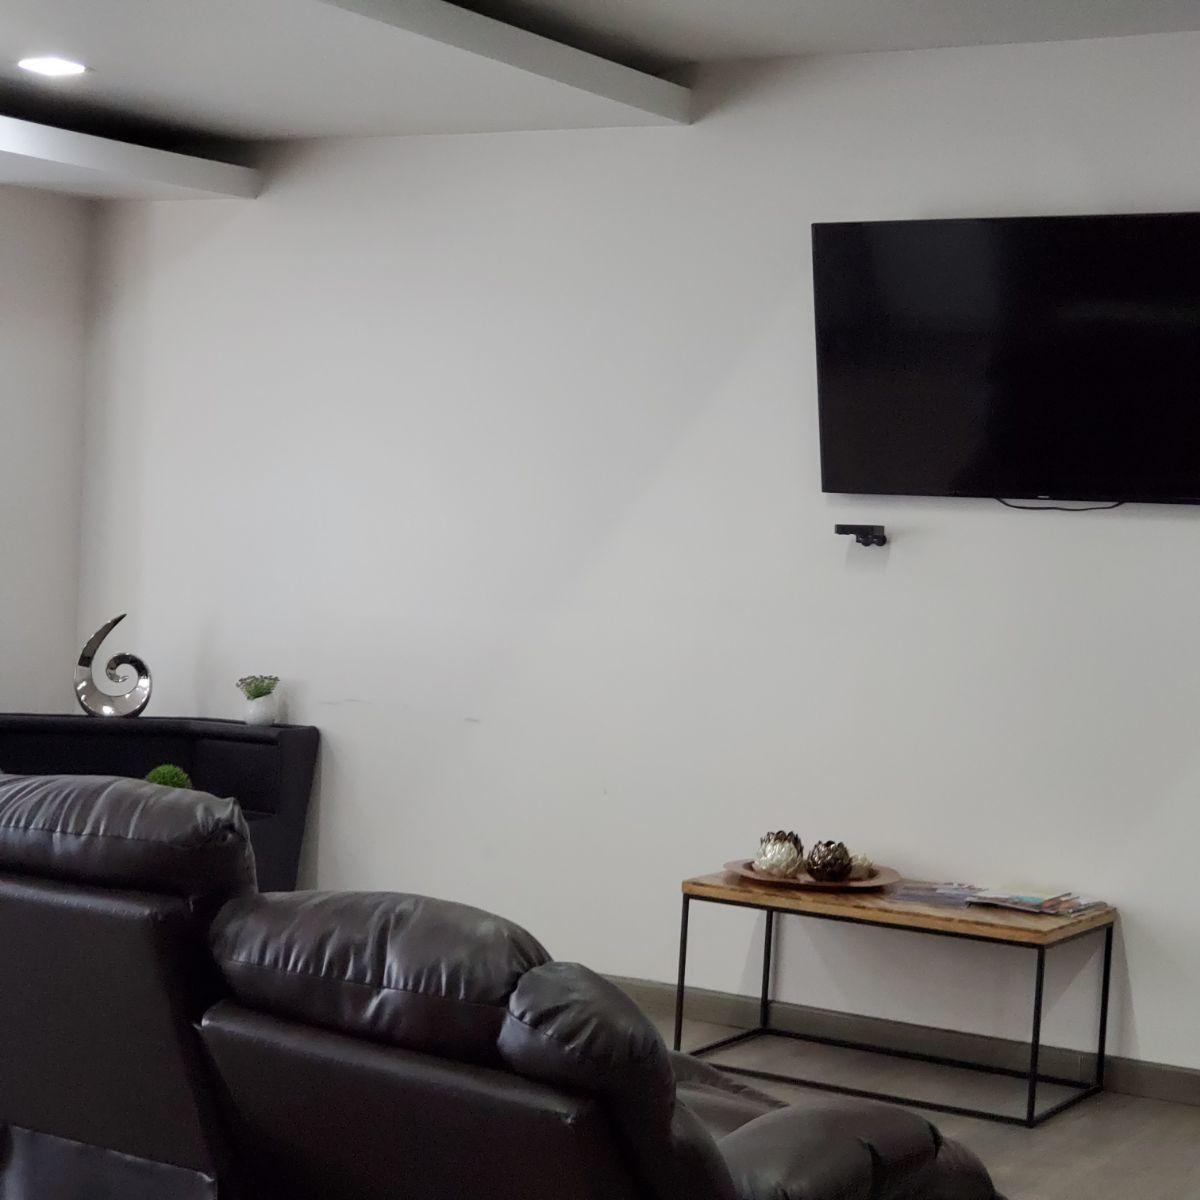 29 de 45: recepción con pantalla TV